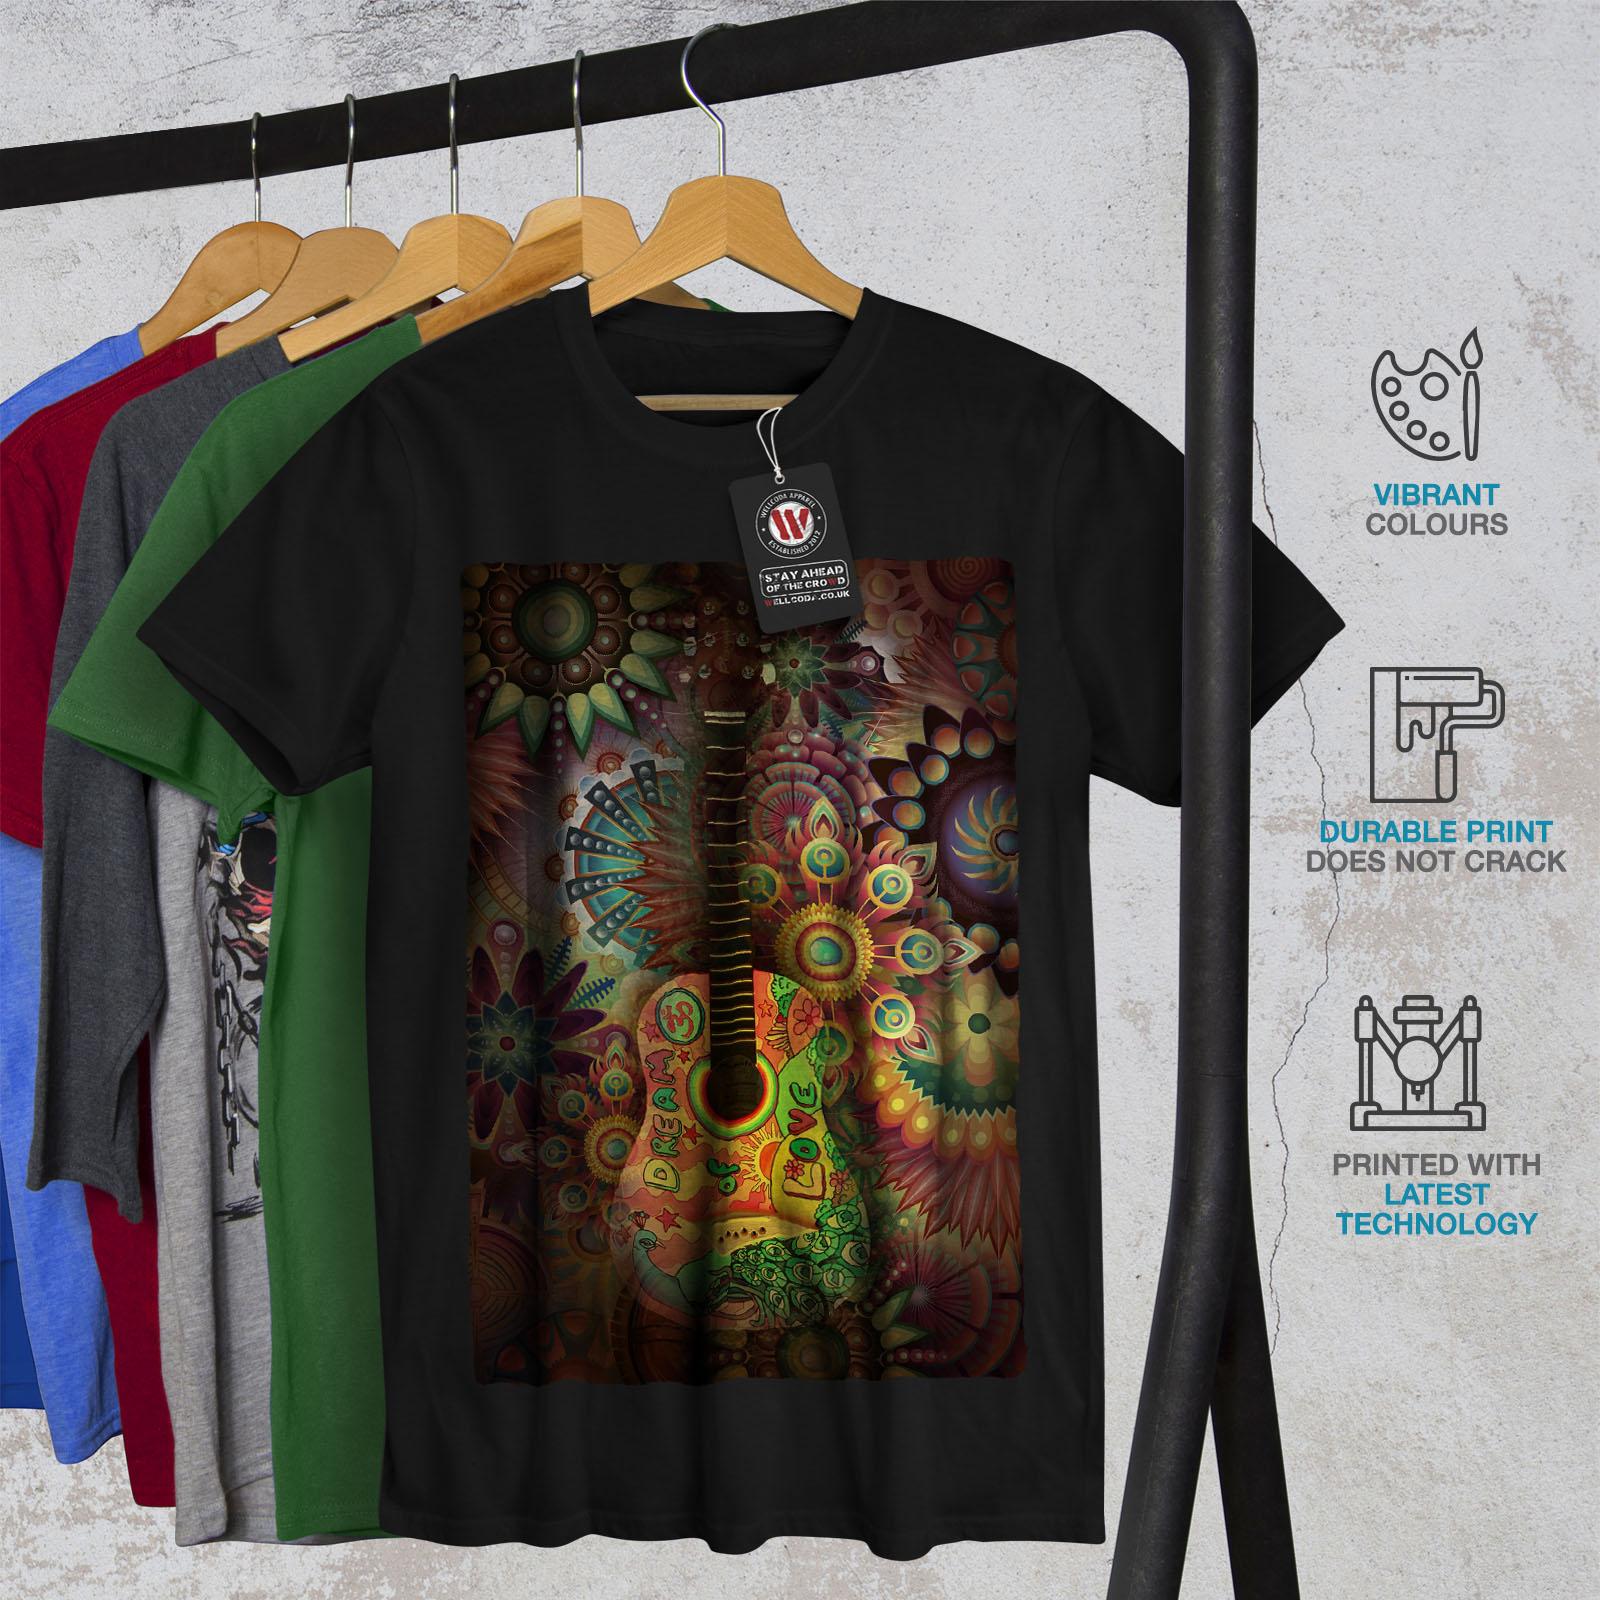 Wellcoda-Colorful-Guitar-Mens-T-shirt-Music-Graphic-Design-Printed-Tee thumbnail 6